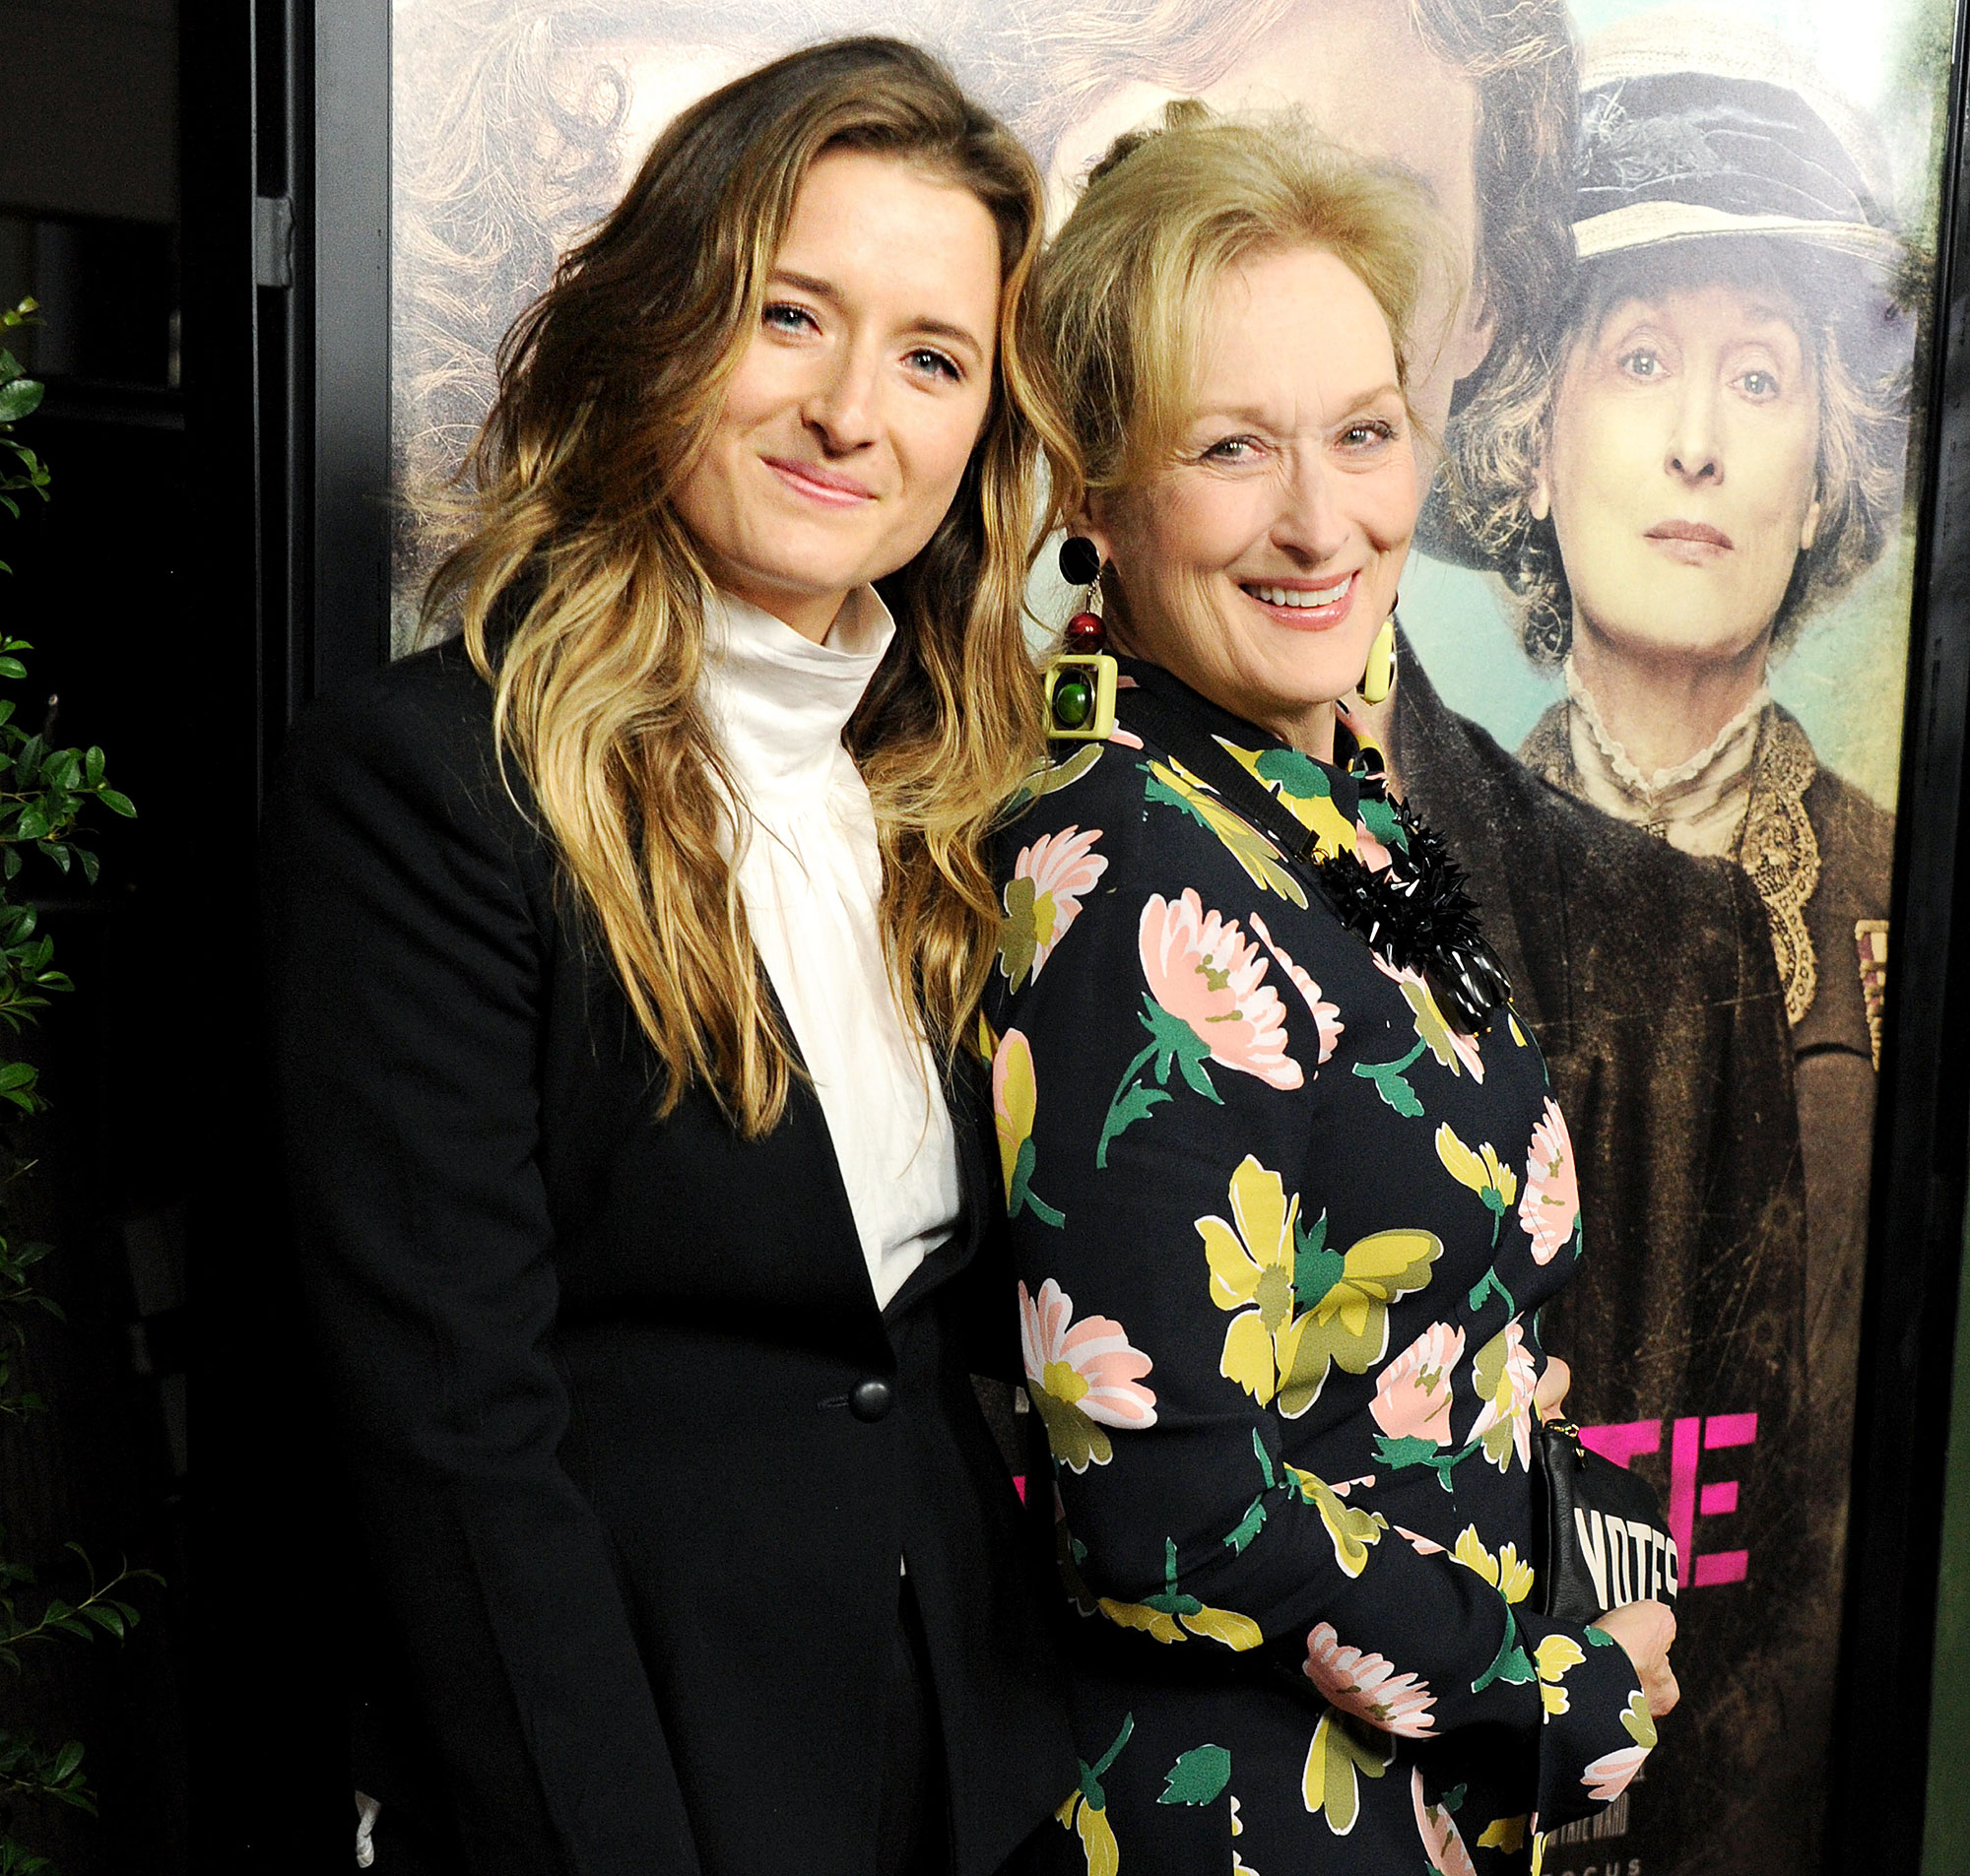 Meryl Streep's Daughter Grace Gummer Files for Divorce From Tay Strathairn After Secret Marriage